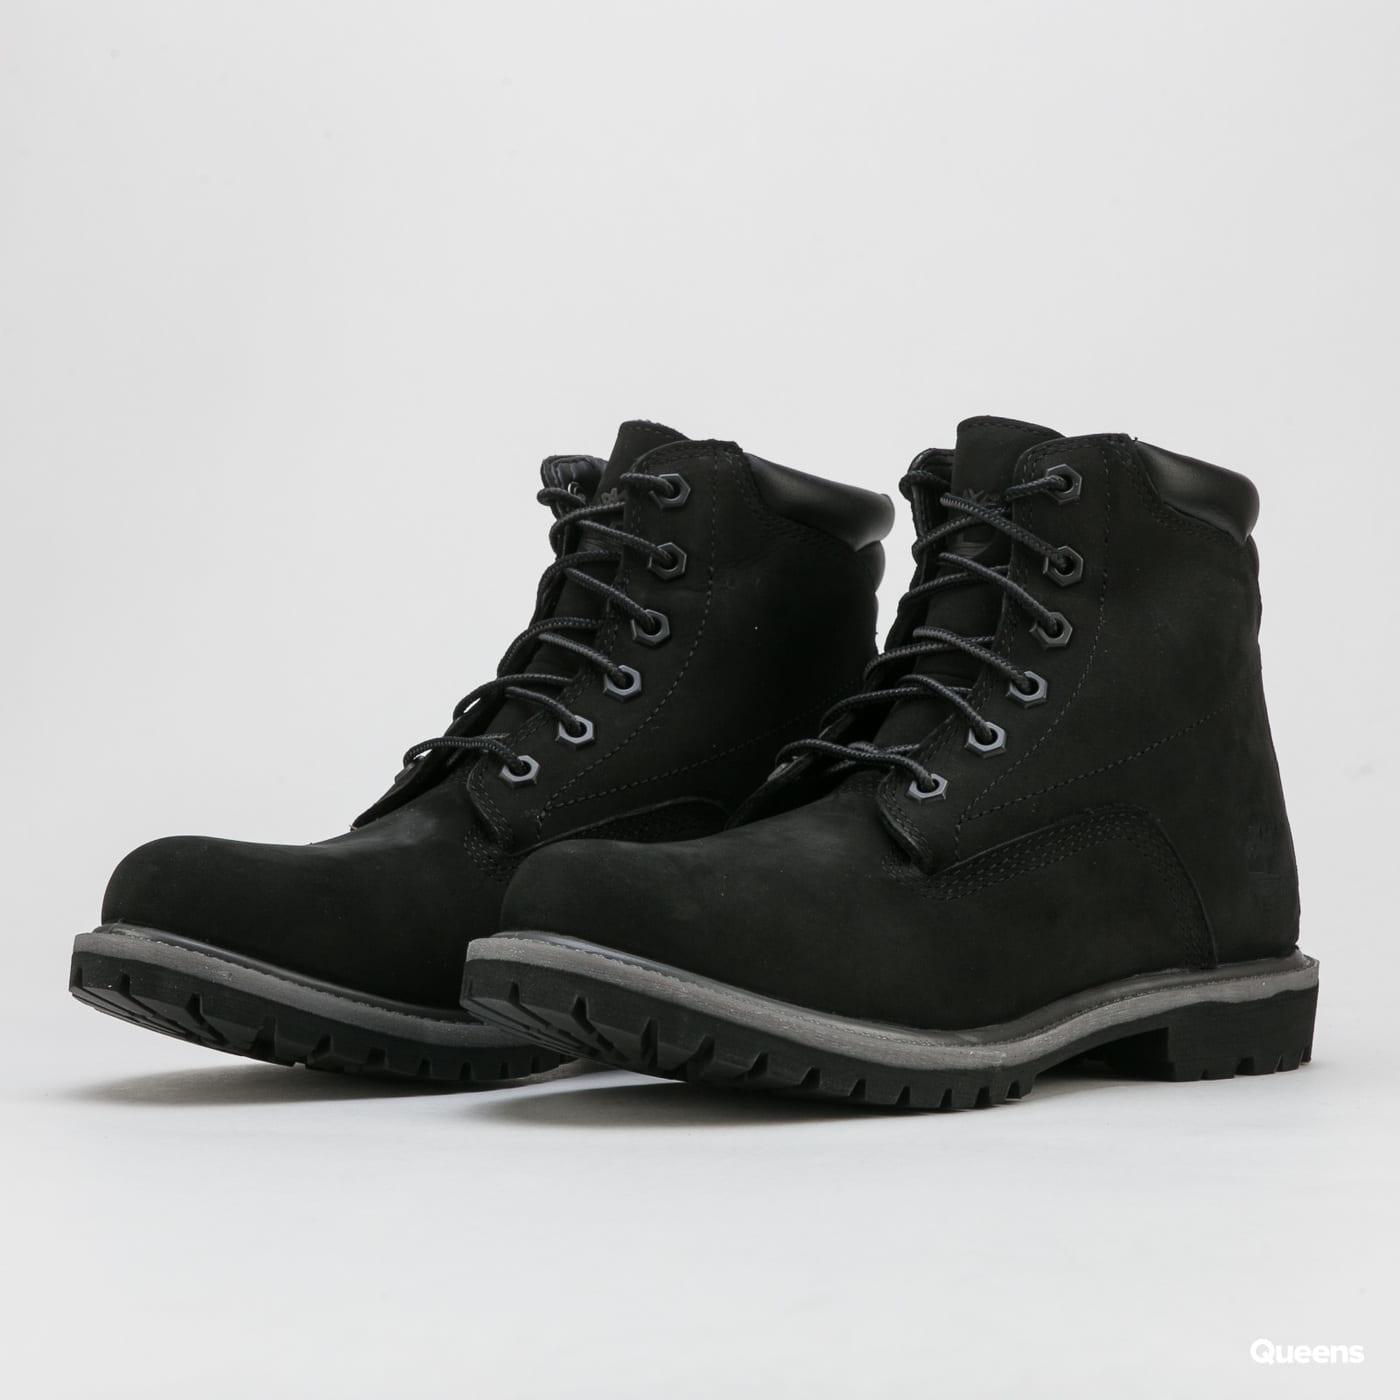 Timberland Waterville 6 Inch Waterproof Boot black nubuck